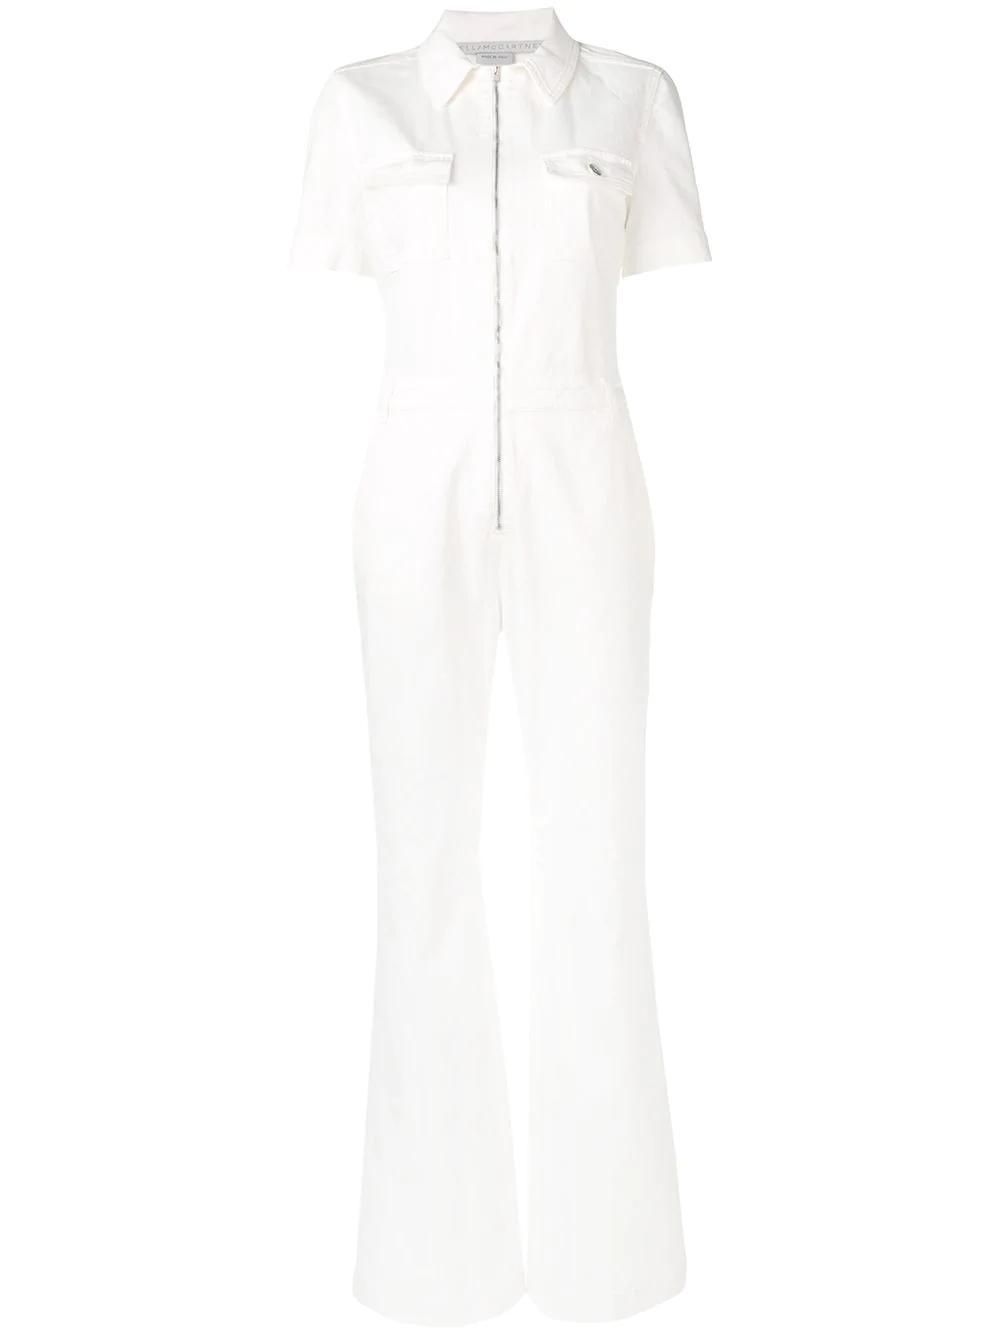 4989c2526934 Stella Mccartney Stretch Denim Jumpsuit In White